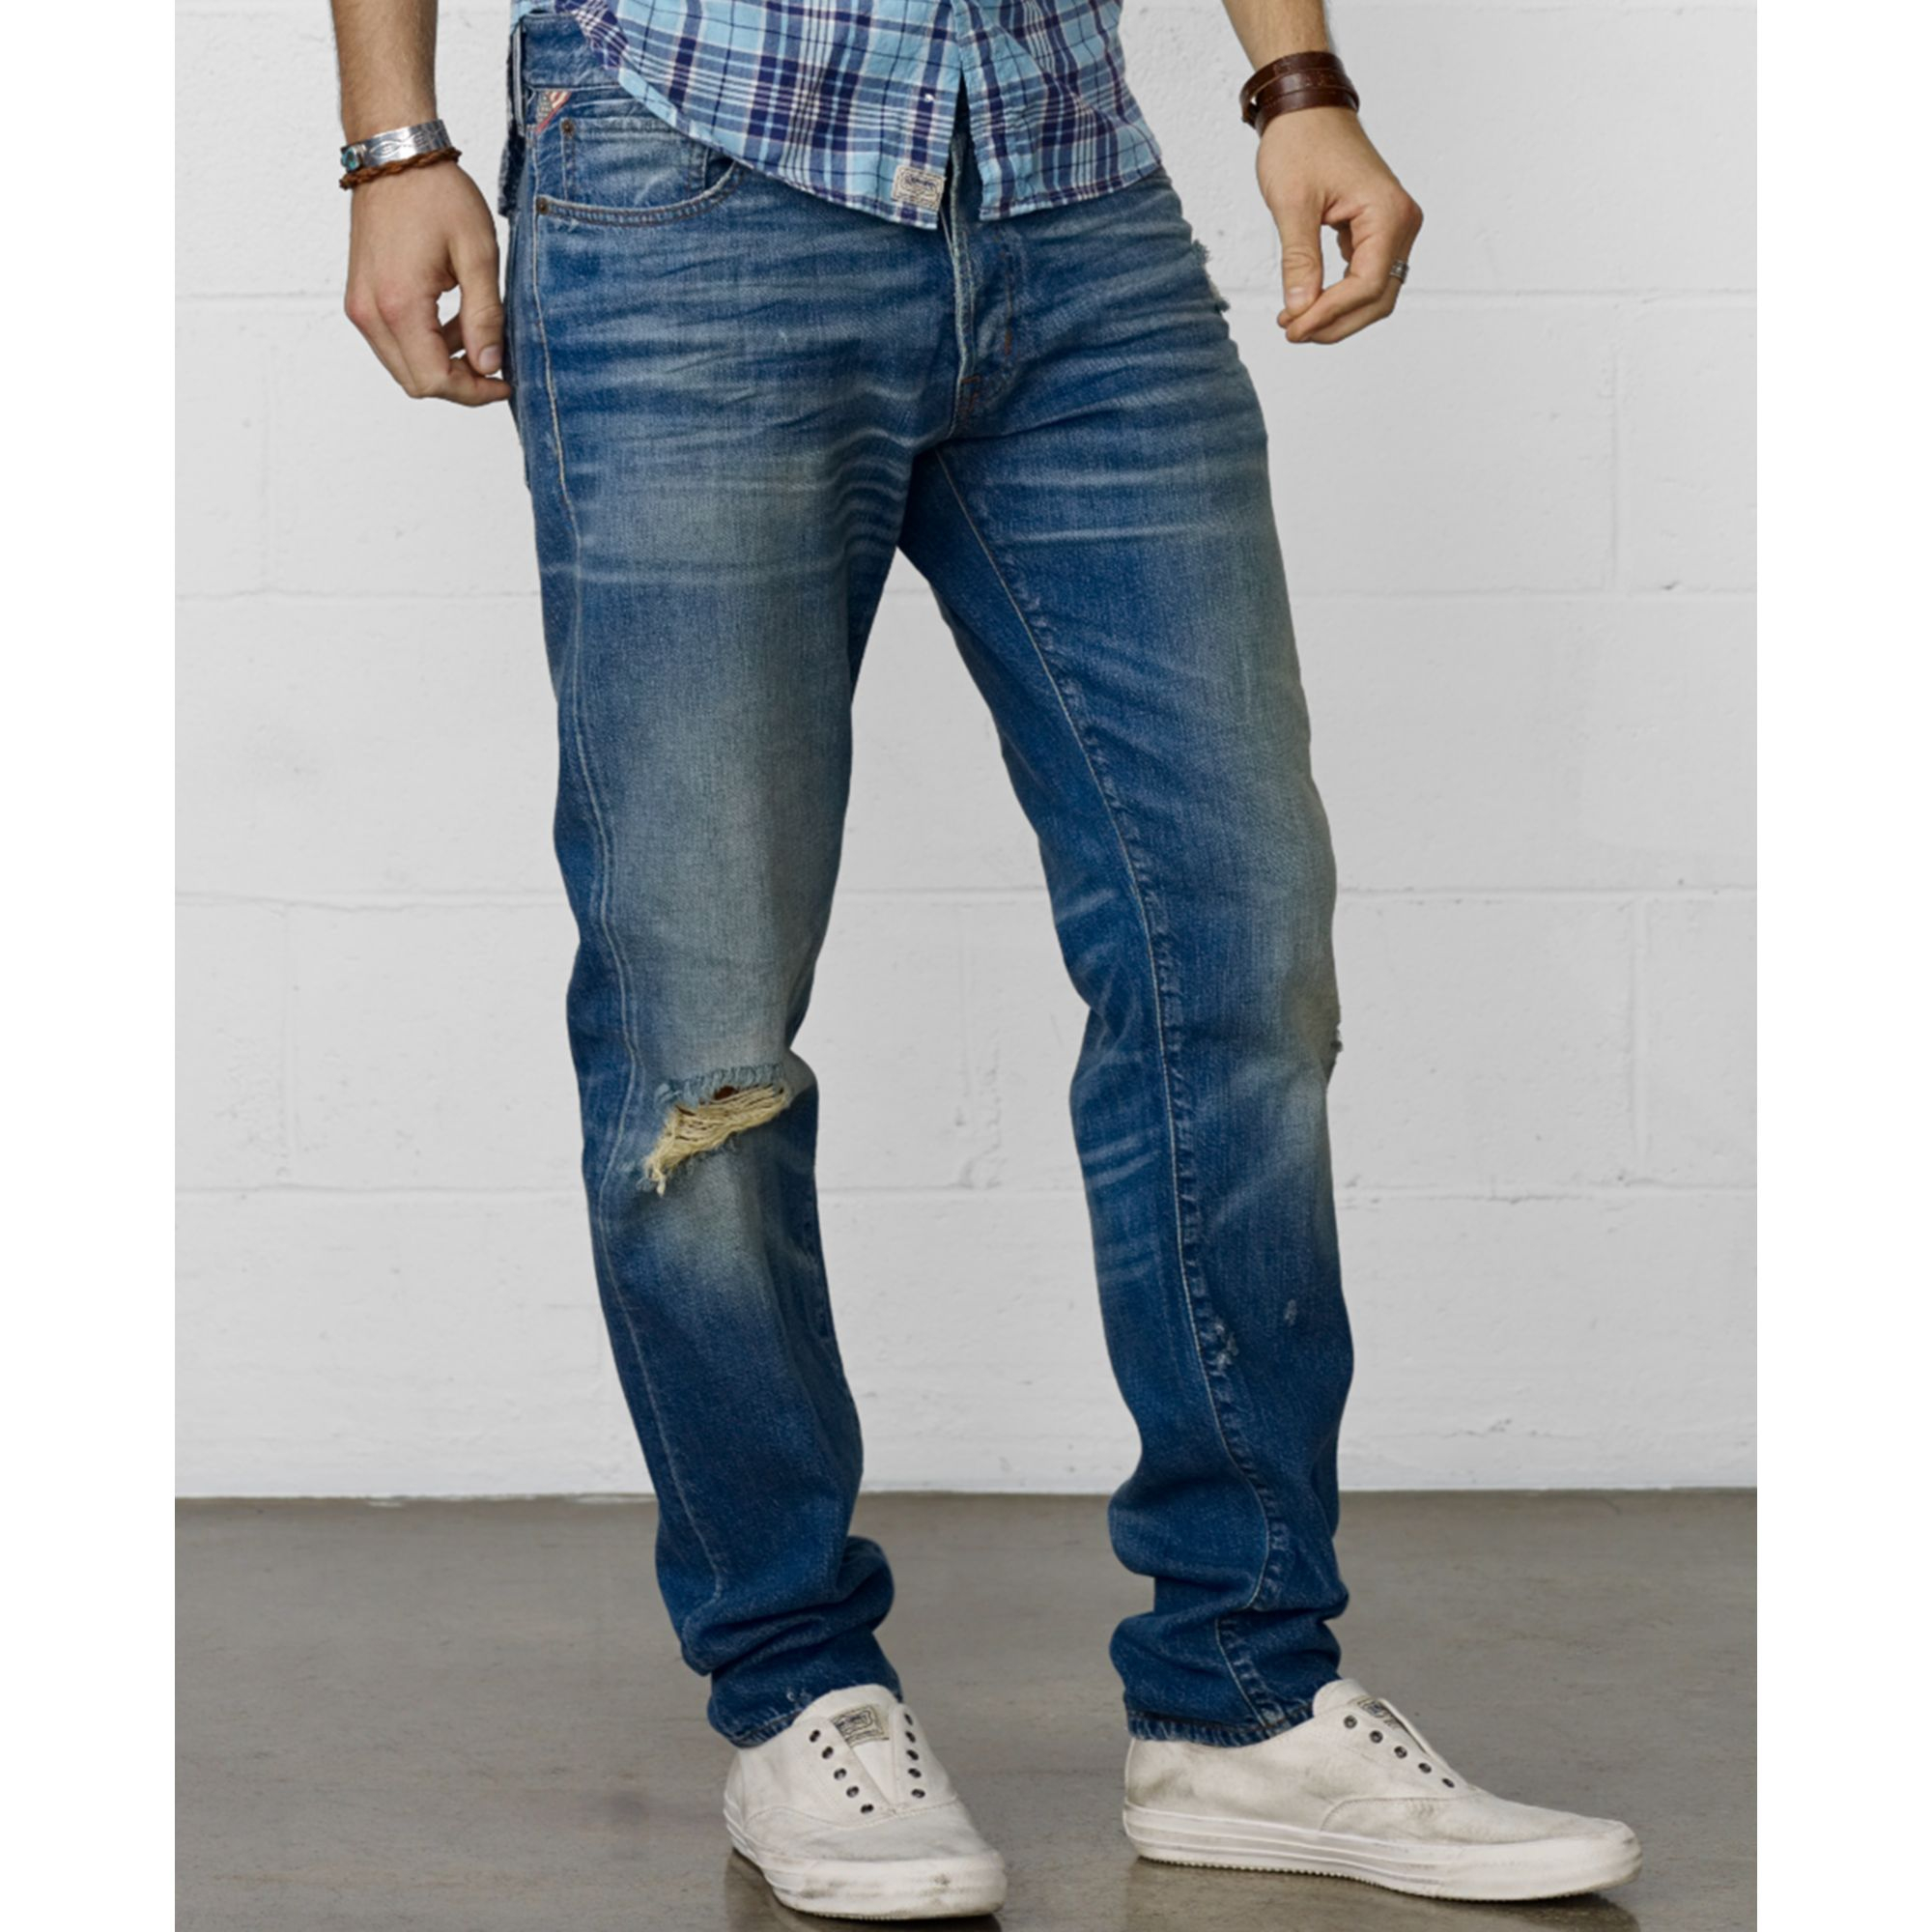 Lyst - Denim   Supply Ralph Lauren Fern Slimfit Jeans in Blue for Men 9b8f748b2915